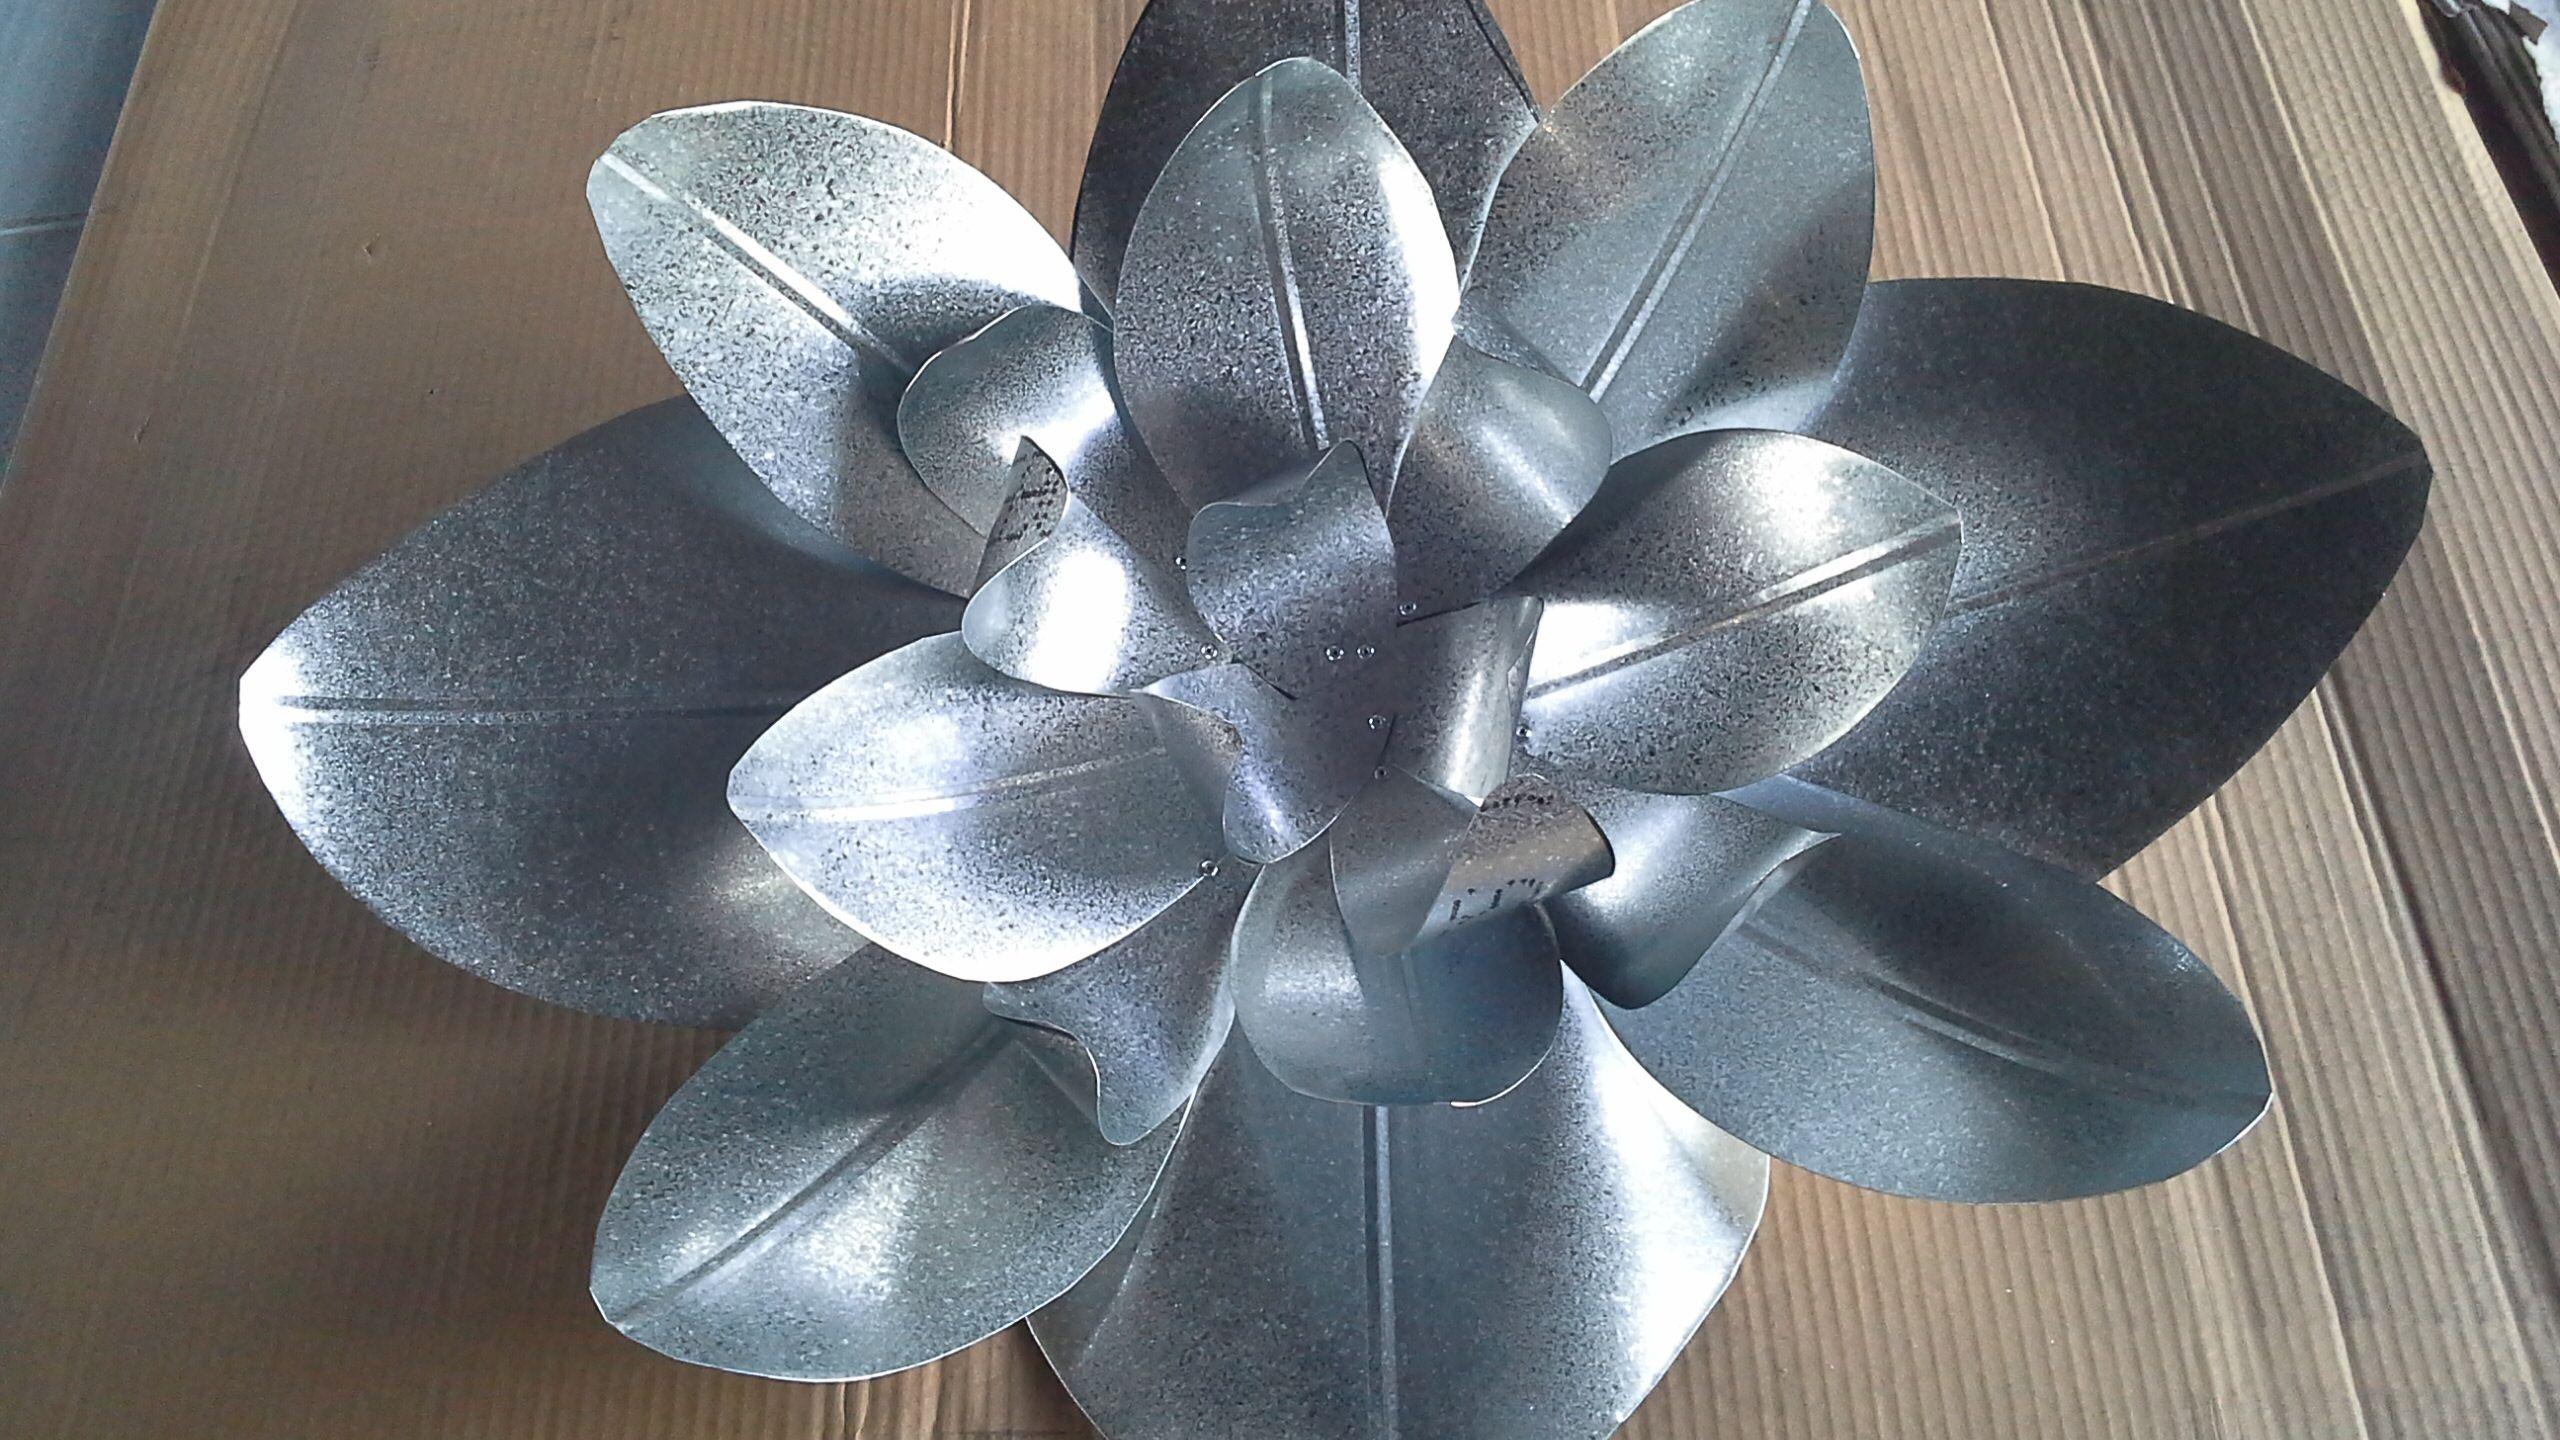 Metal Wing Sculpture Wing And A Prayer Metal Art Scrap Metal Art Welding Art